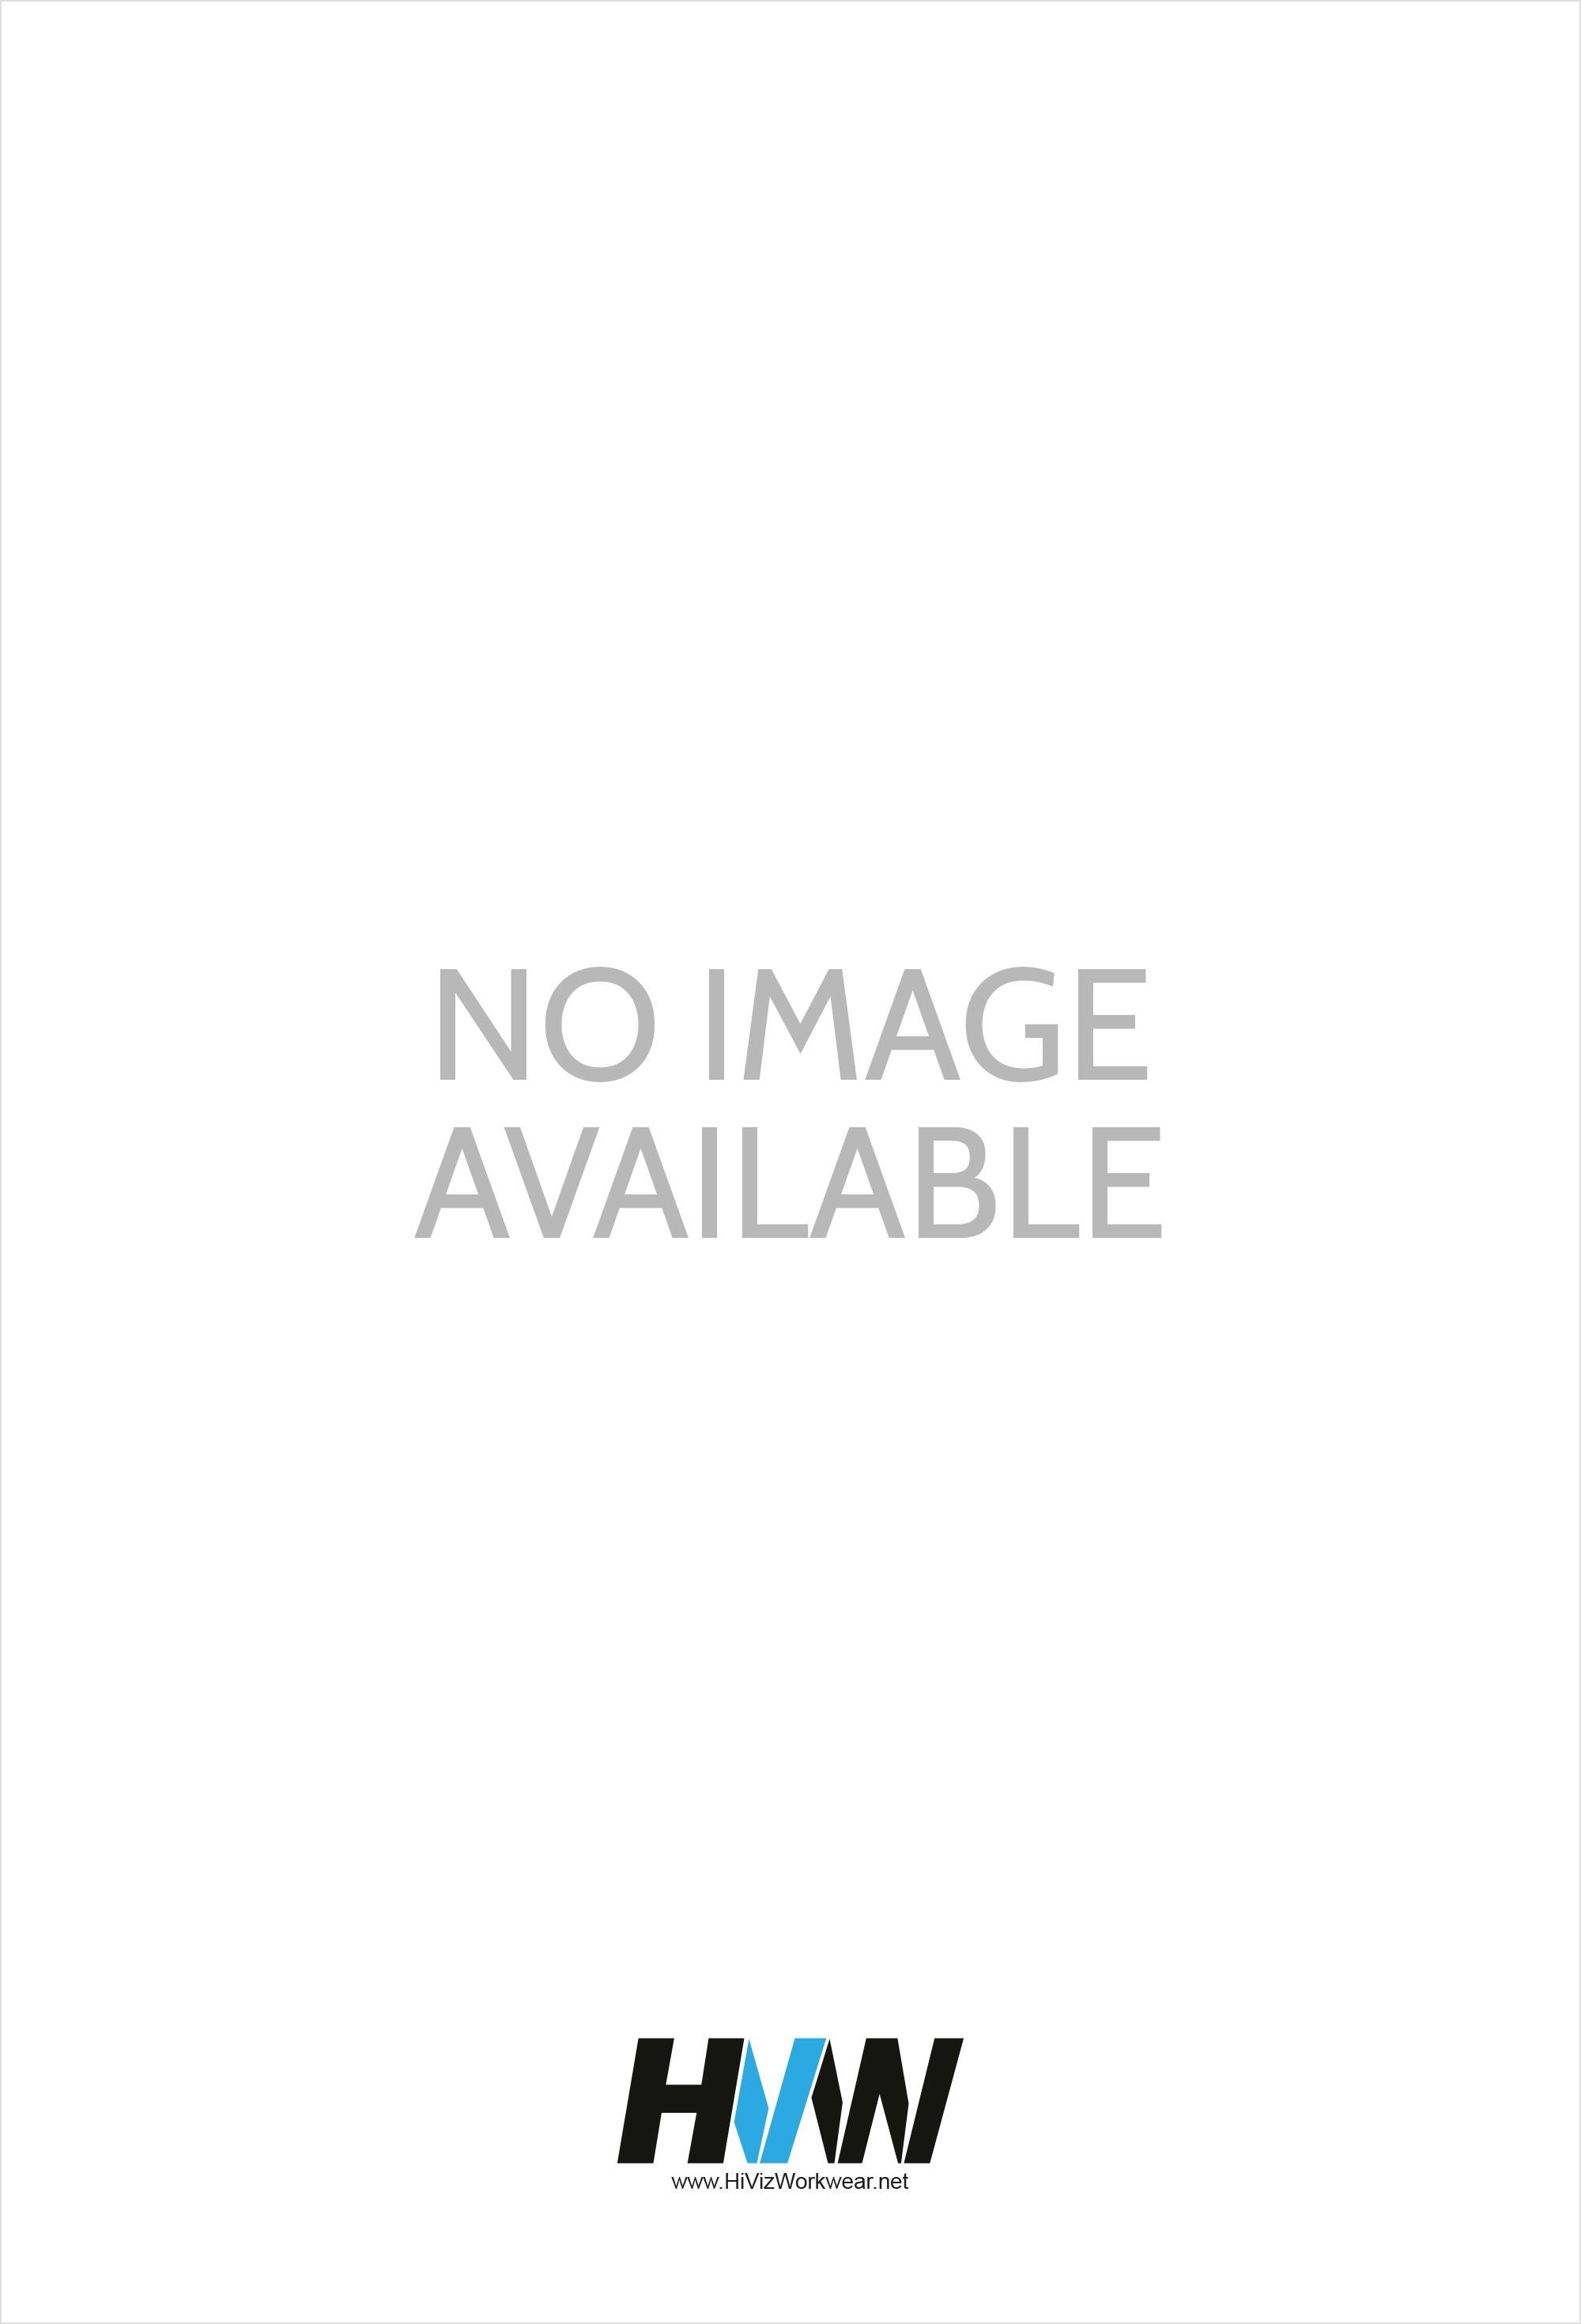 KK131 Tailored Buisness Long Sleeved Shirt  (Collar Size 14.5 To 18.5)